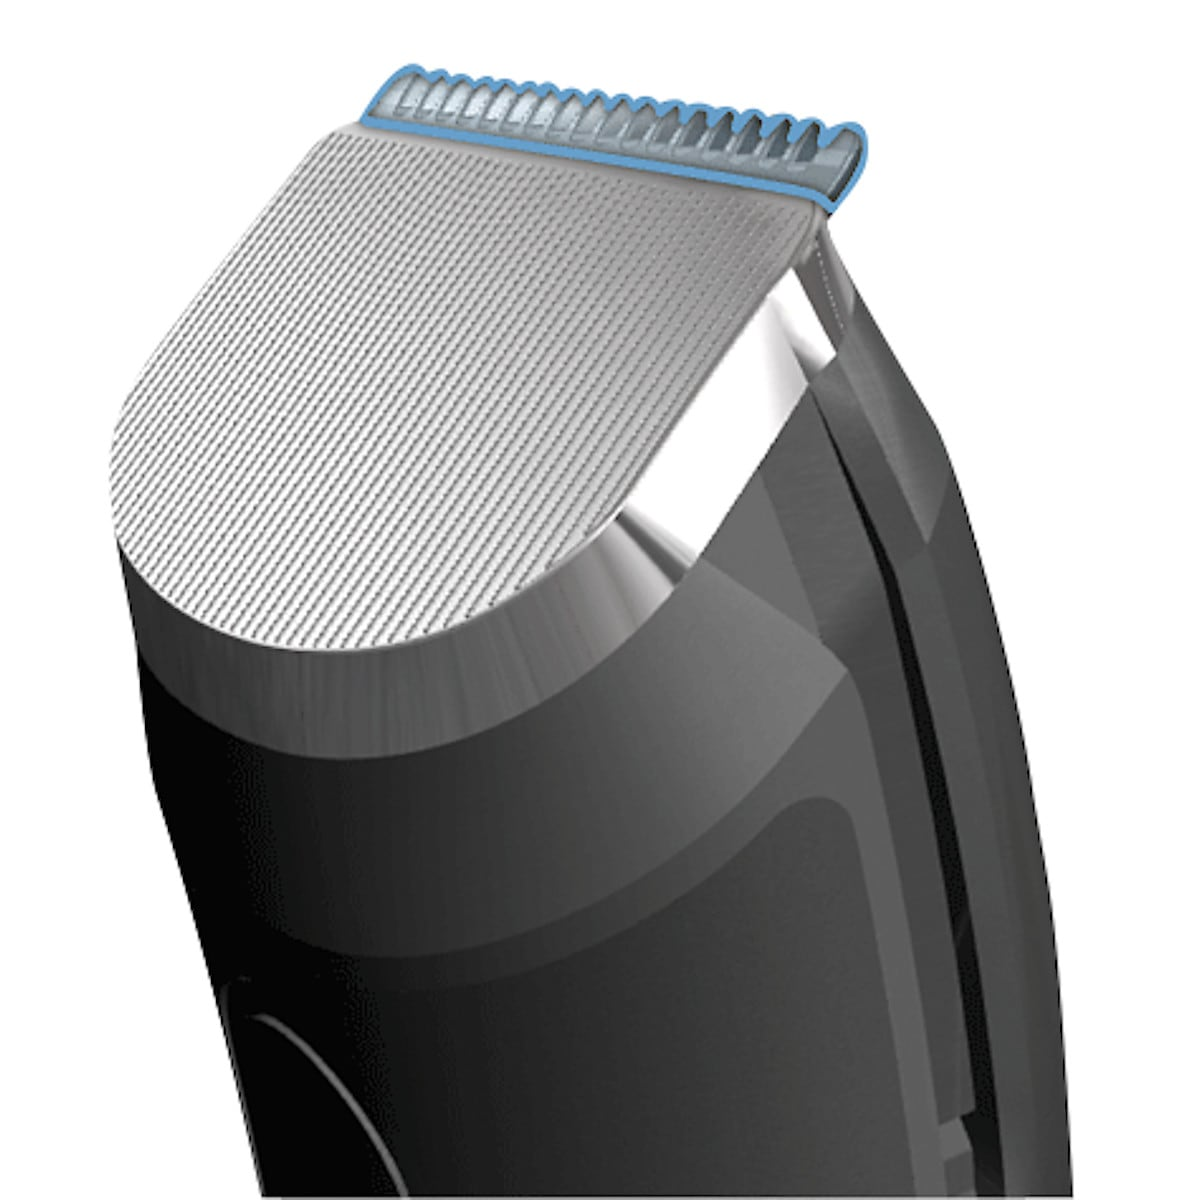 Braun CruZer 5 Beard skjeggtrimmer